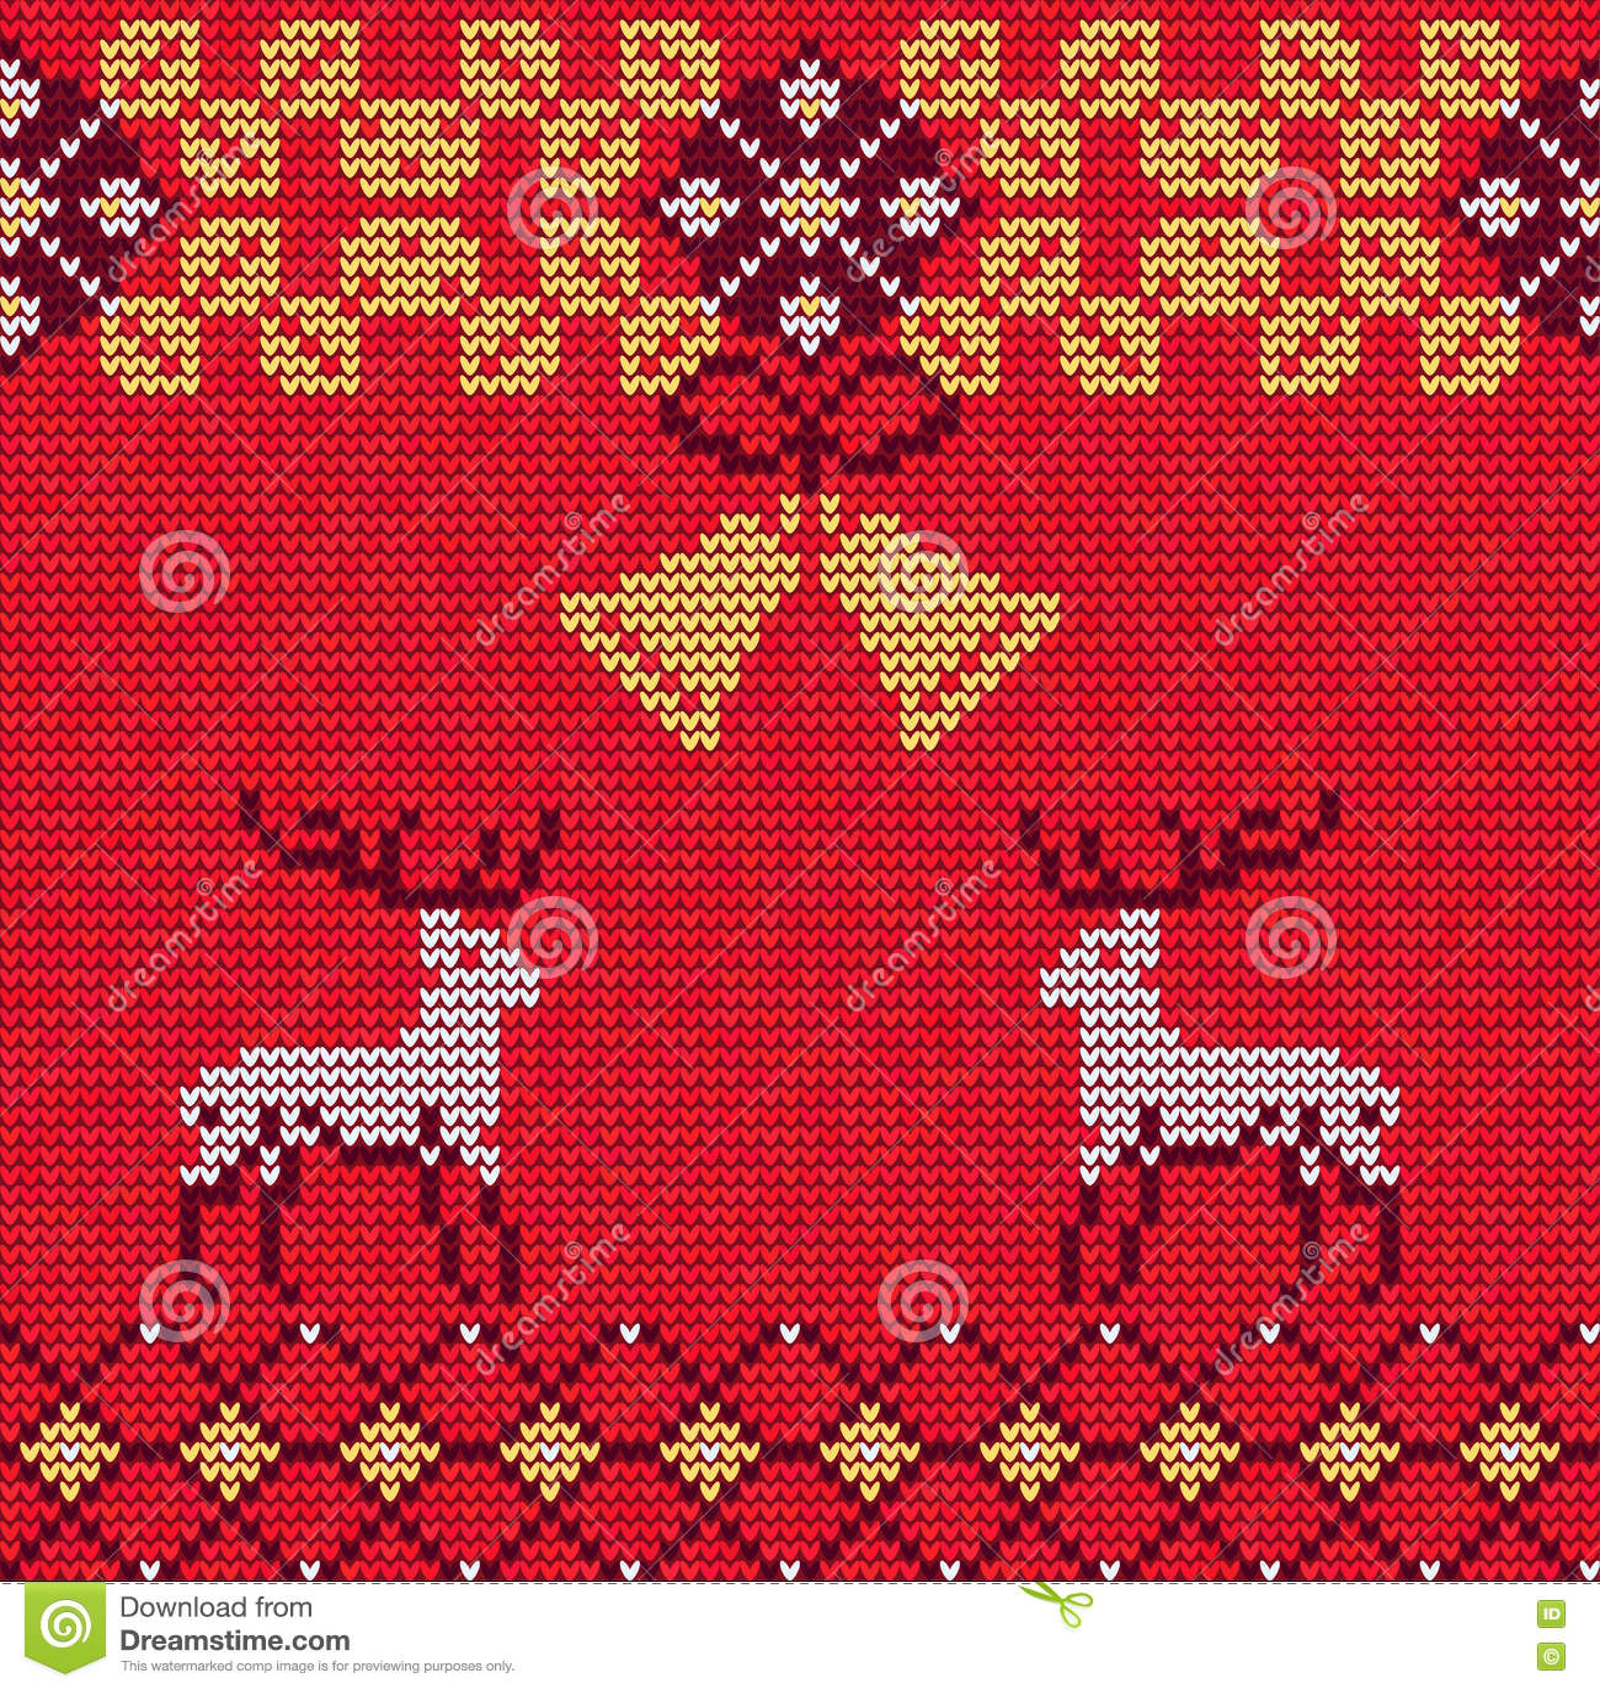 christmas sweater pattern 12 - Christmas Sweater Wallpaper